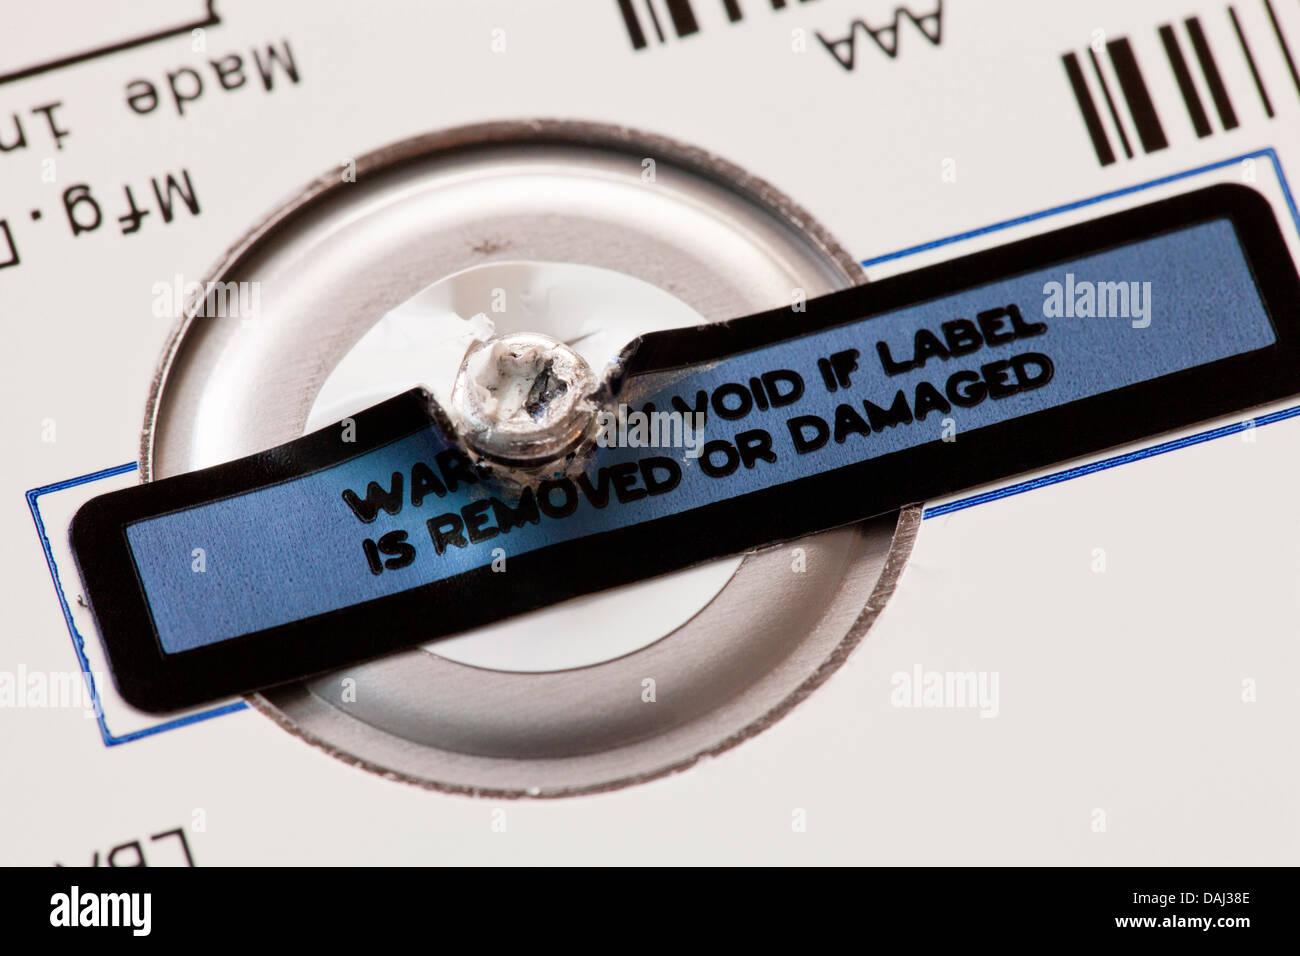 Damaged warranty void label - Stock Image